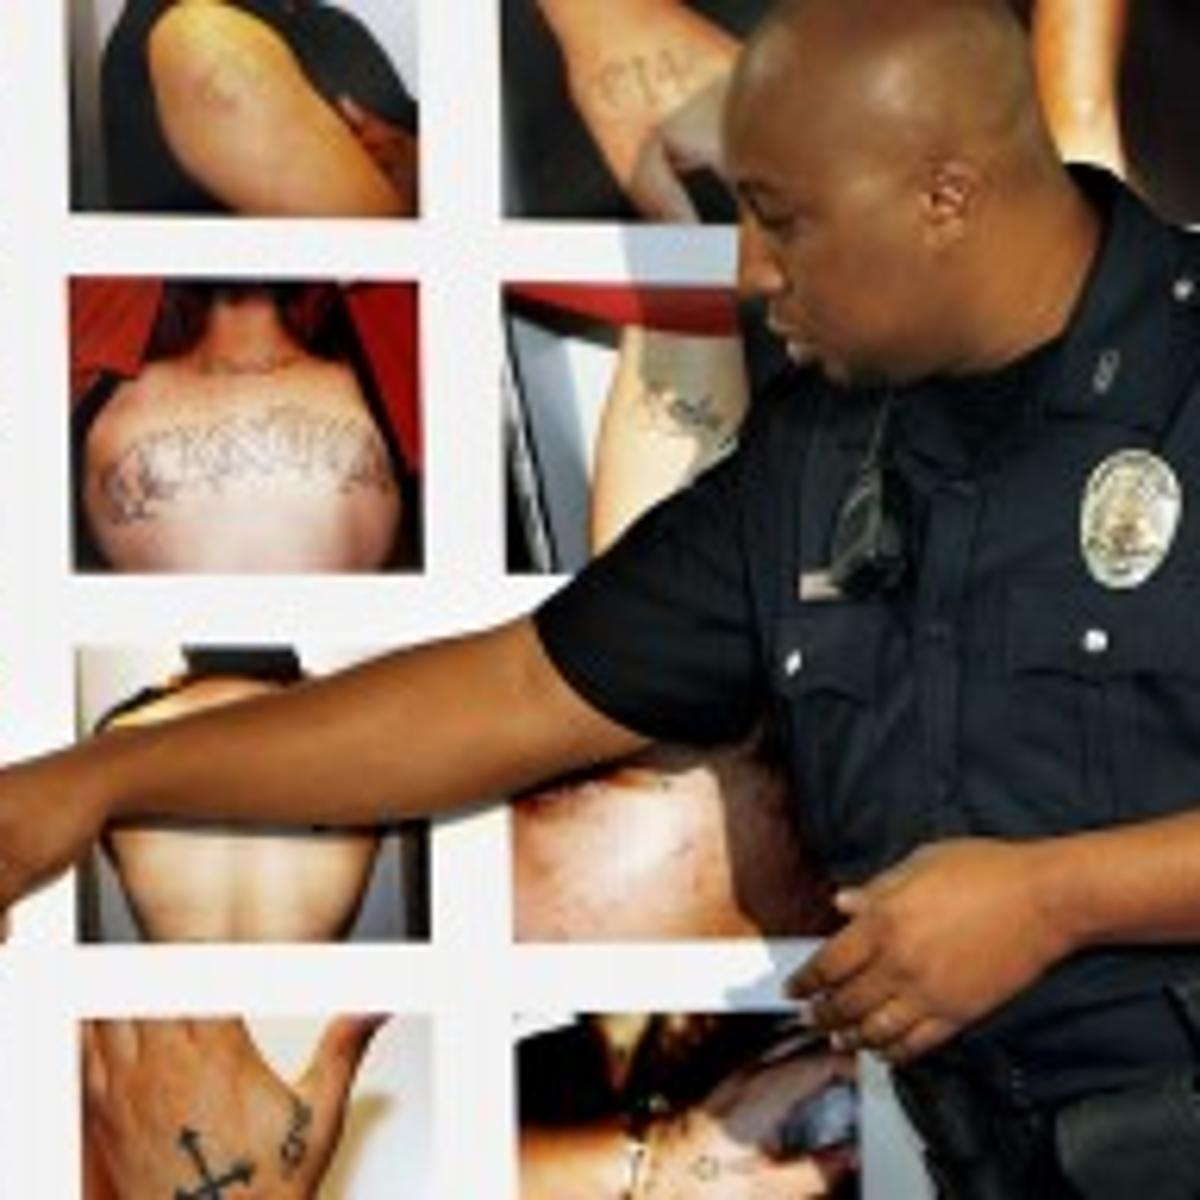 Gang activity in Madison often flies under the public radar